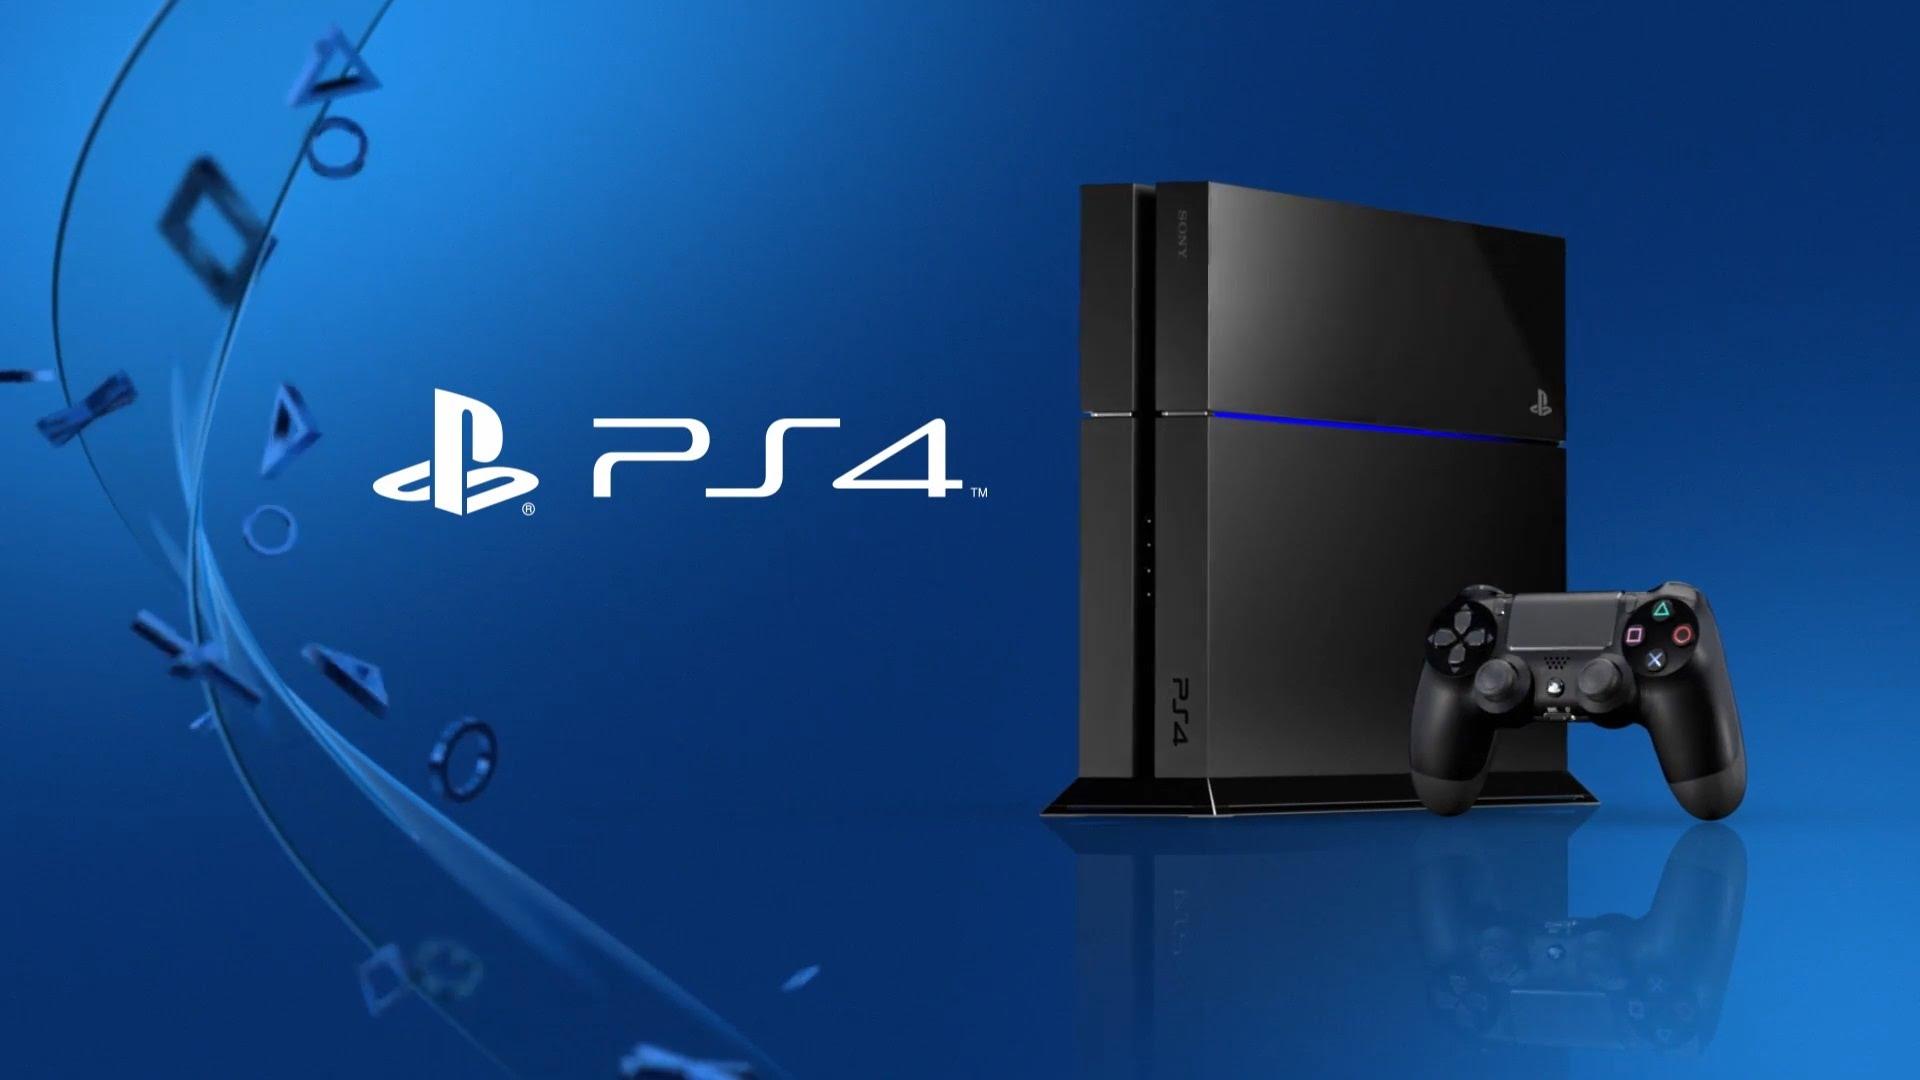 E3 前夕 PS4 傳聞再減價   清貨為迎接新遊戲機?